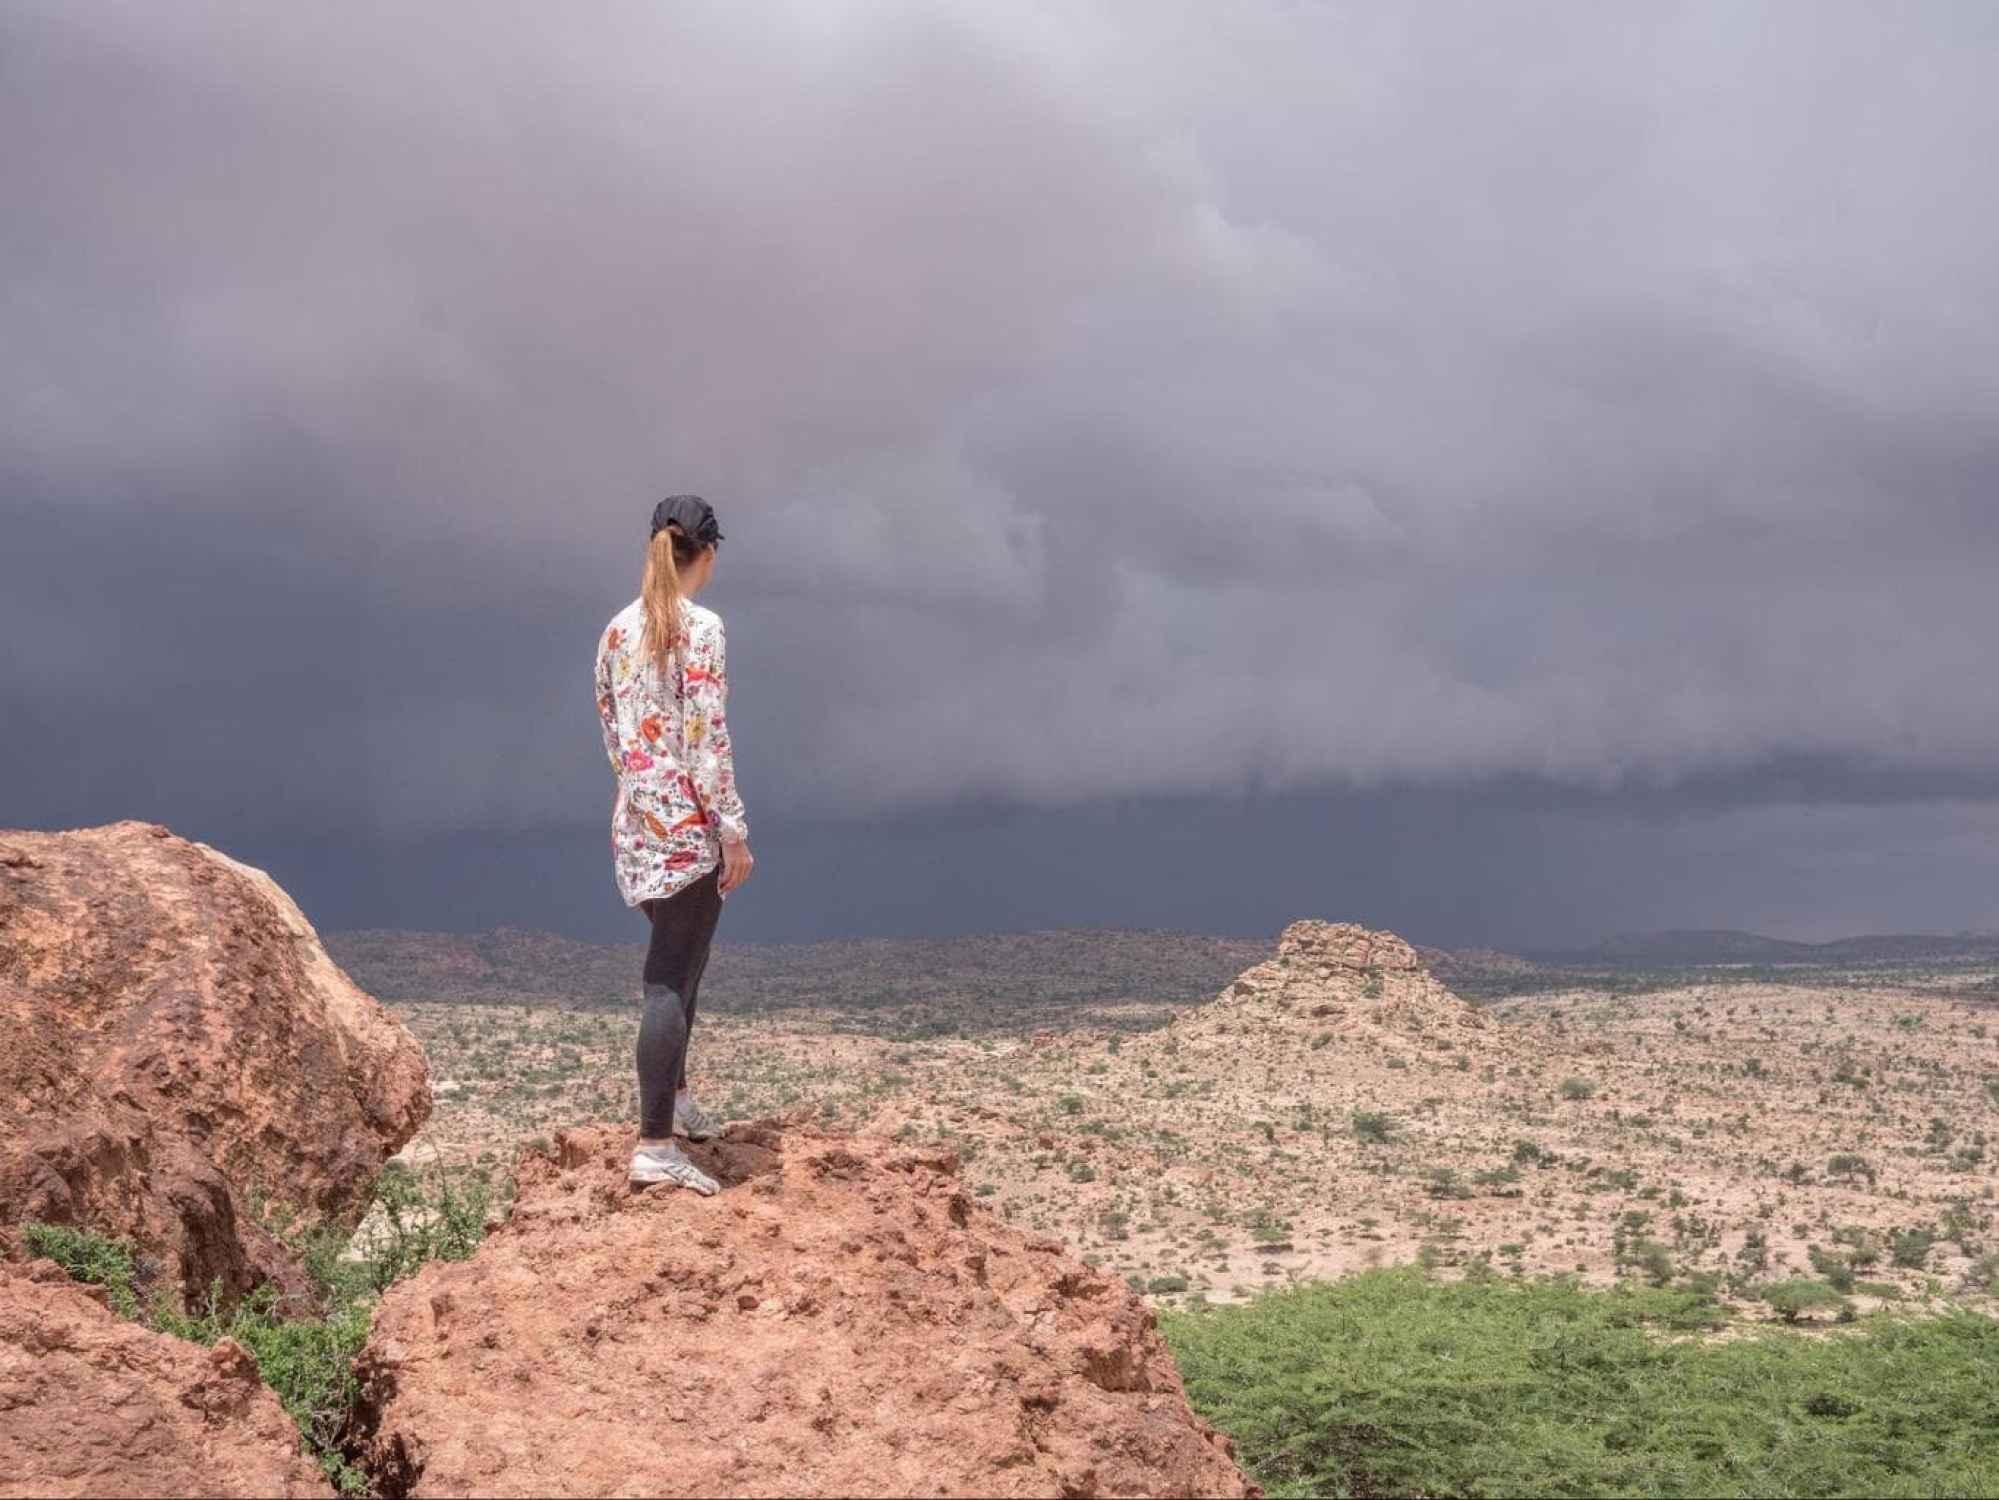 The highest point in Laas Geel